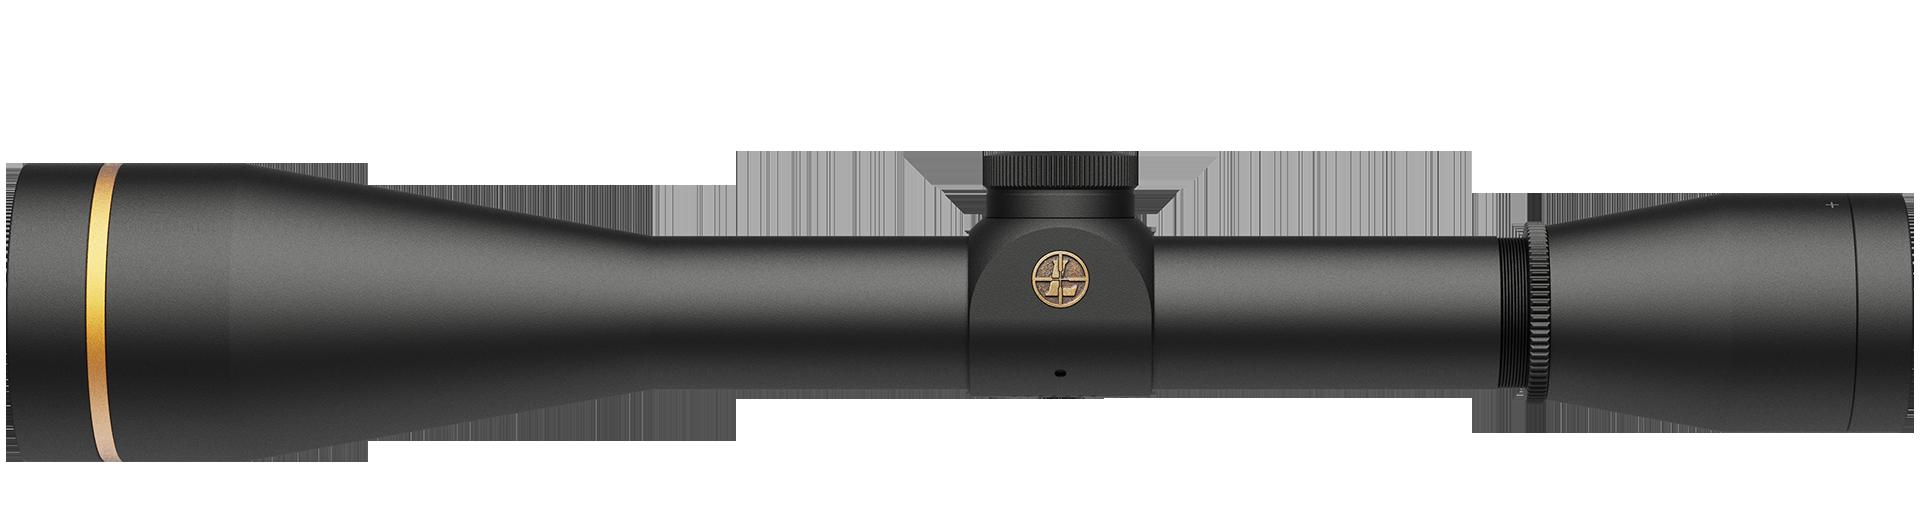 6x42mm